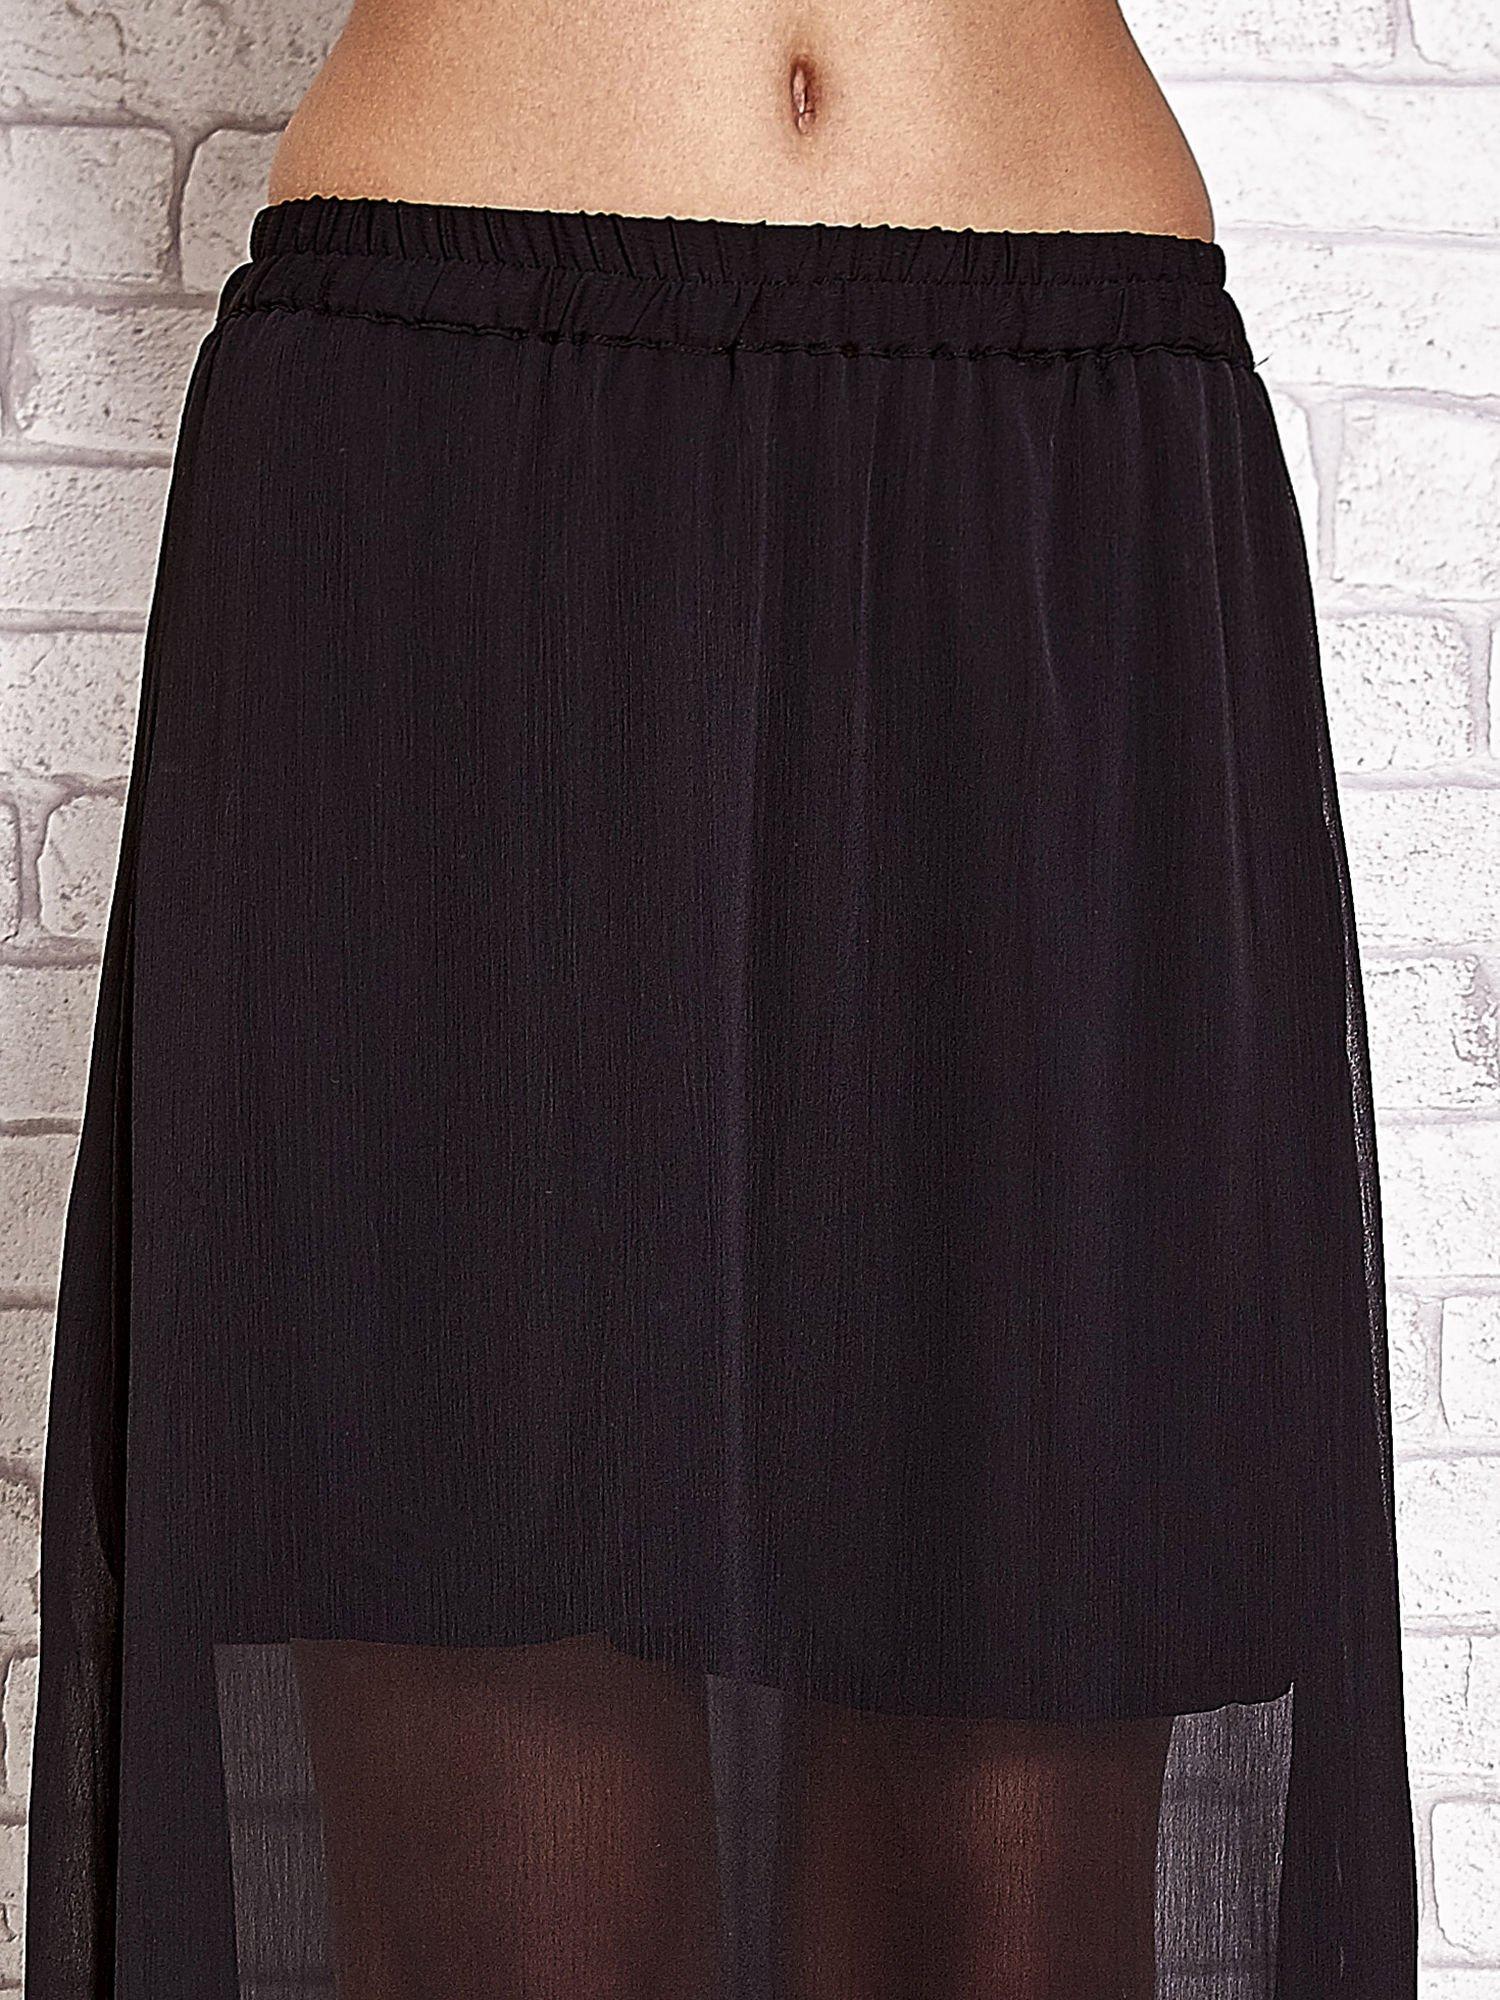 Czarna transparentna spódnica maxi                                  zdj.                                  5